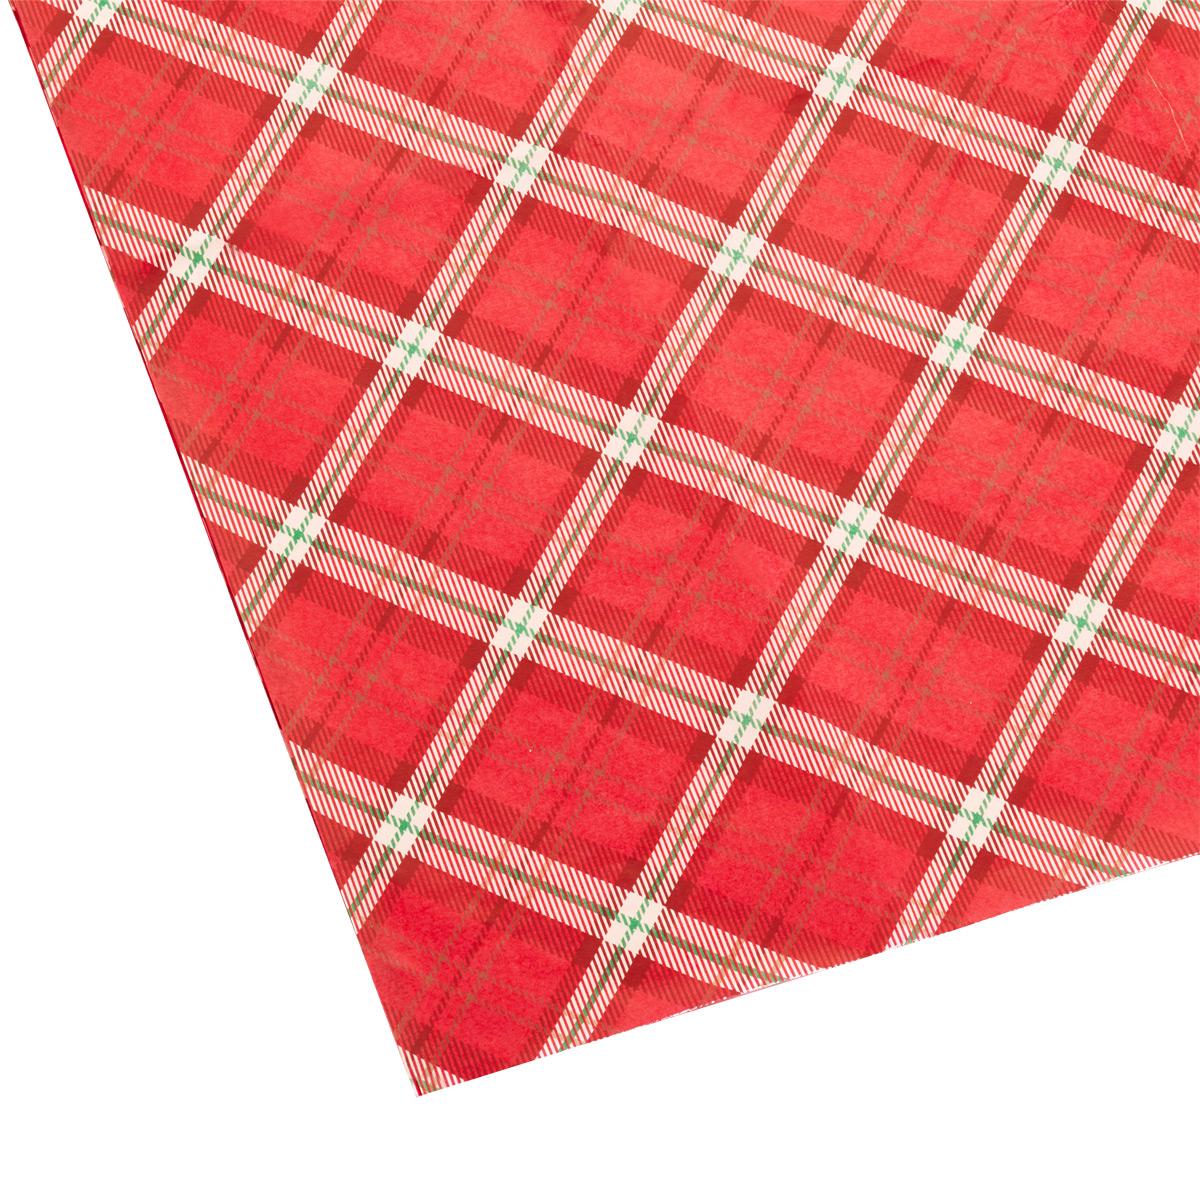 Tissue Sheets Large Plaid